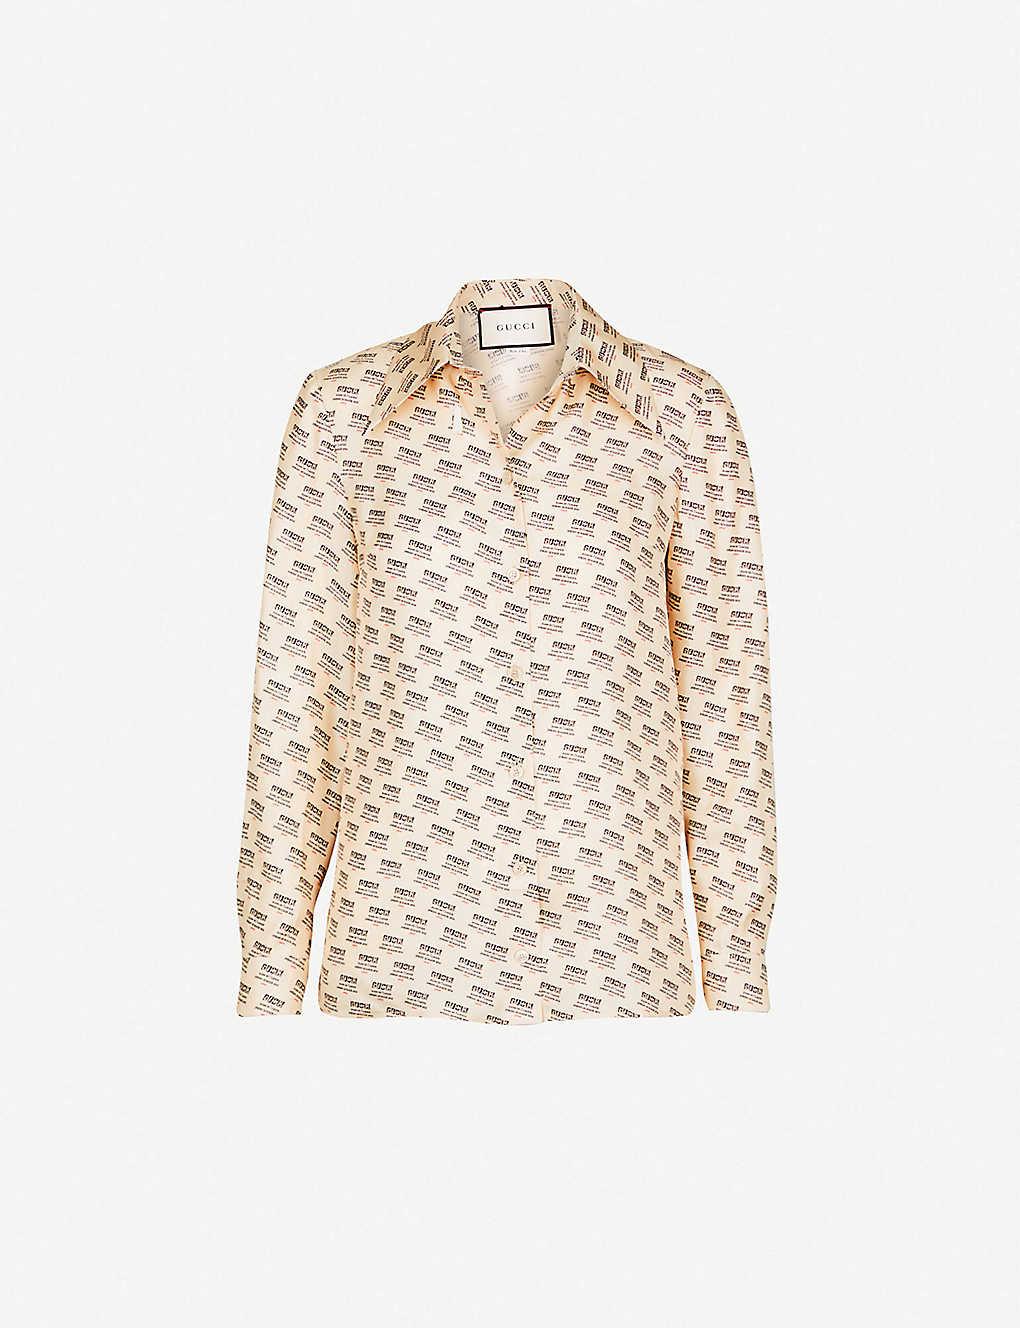 5fb5c855b4e2 GUCCI - Invite Stamp silk-twill shirt | Selfridges.com